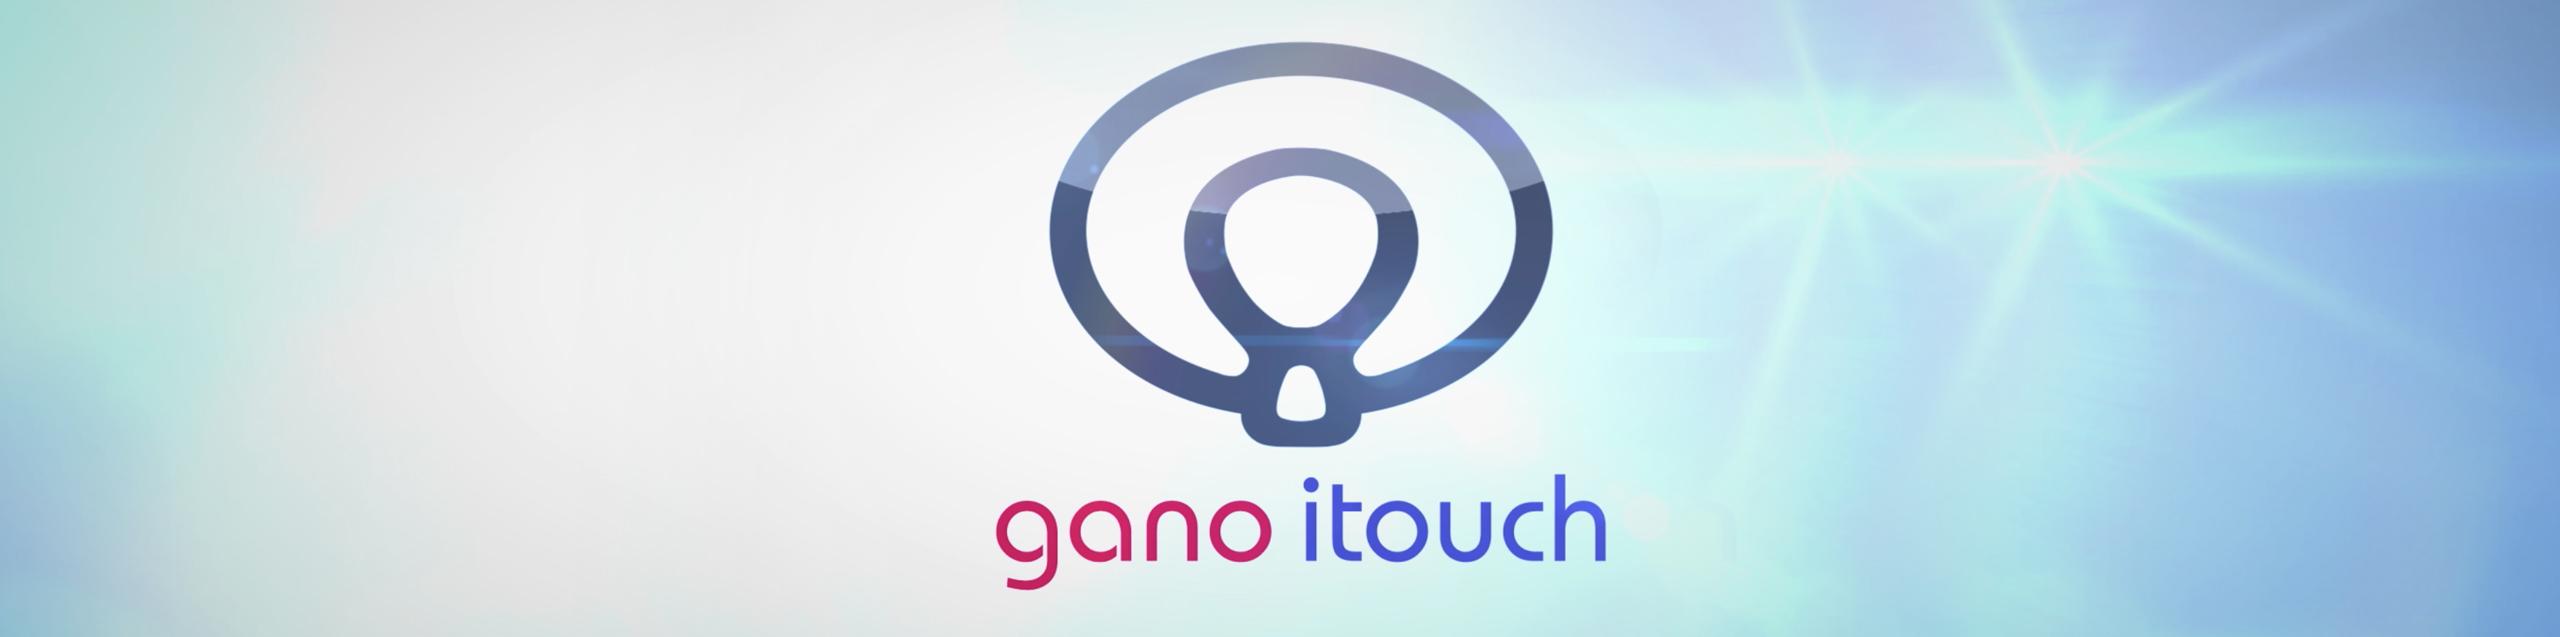 LOGO-GANO-ITOUCH